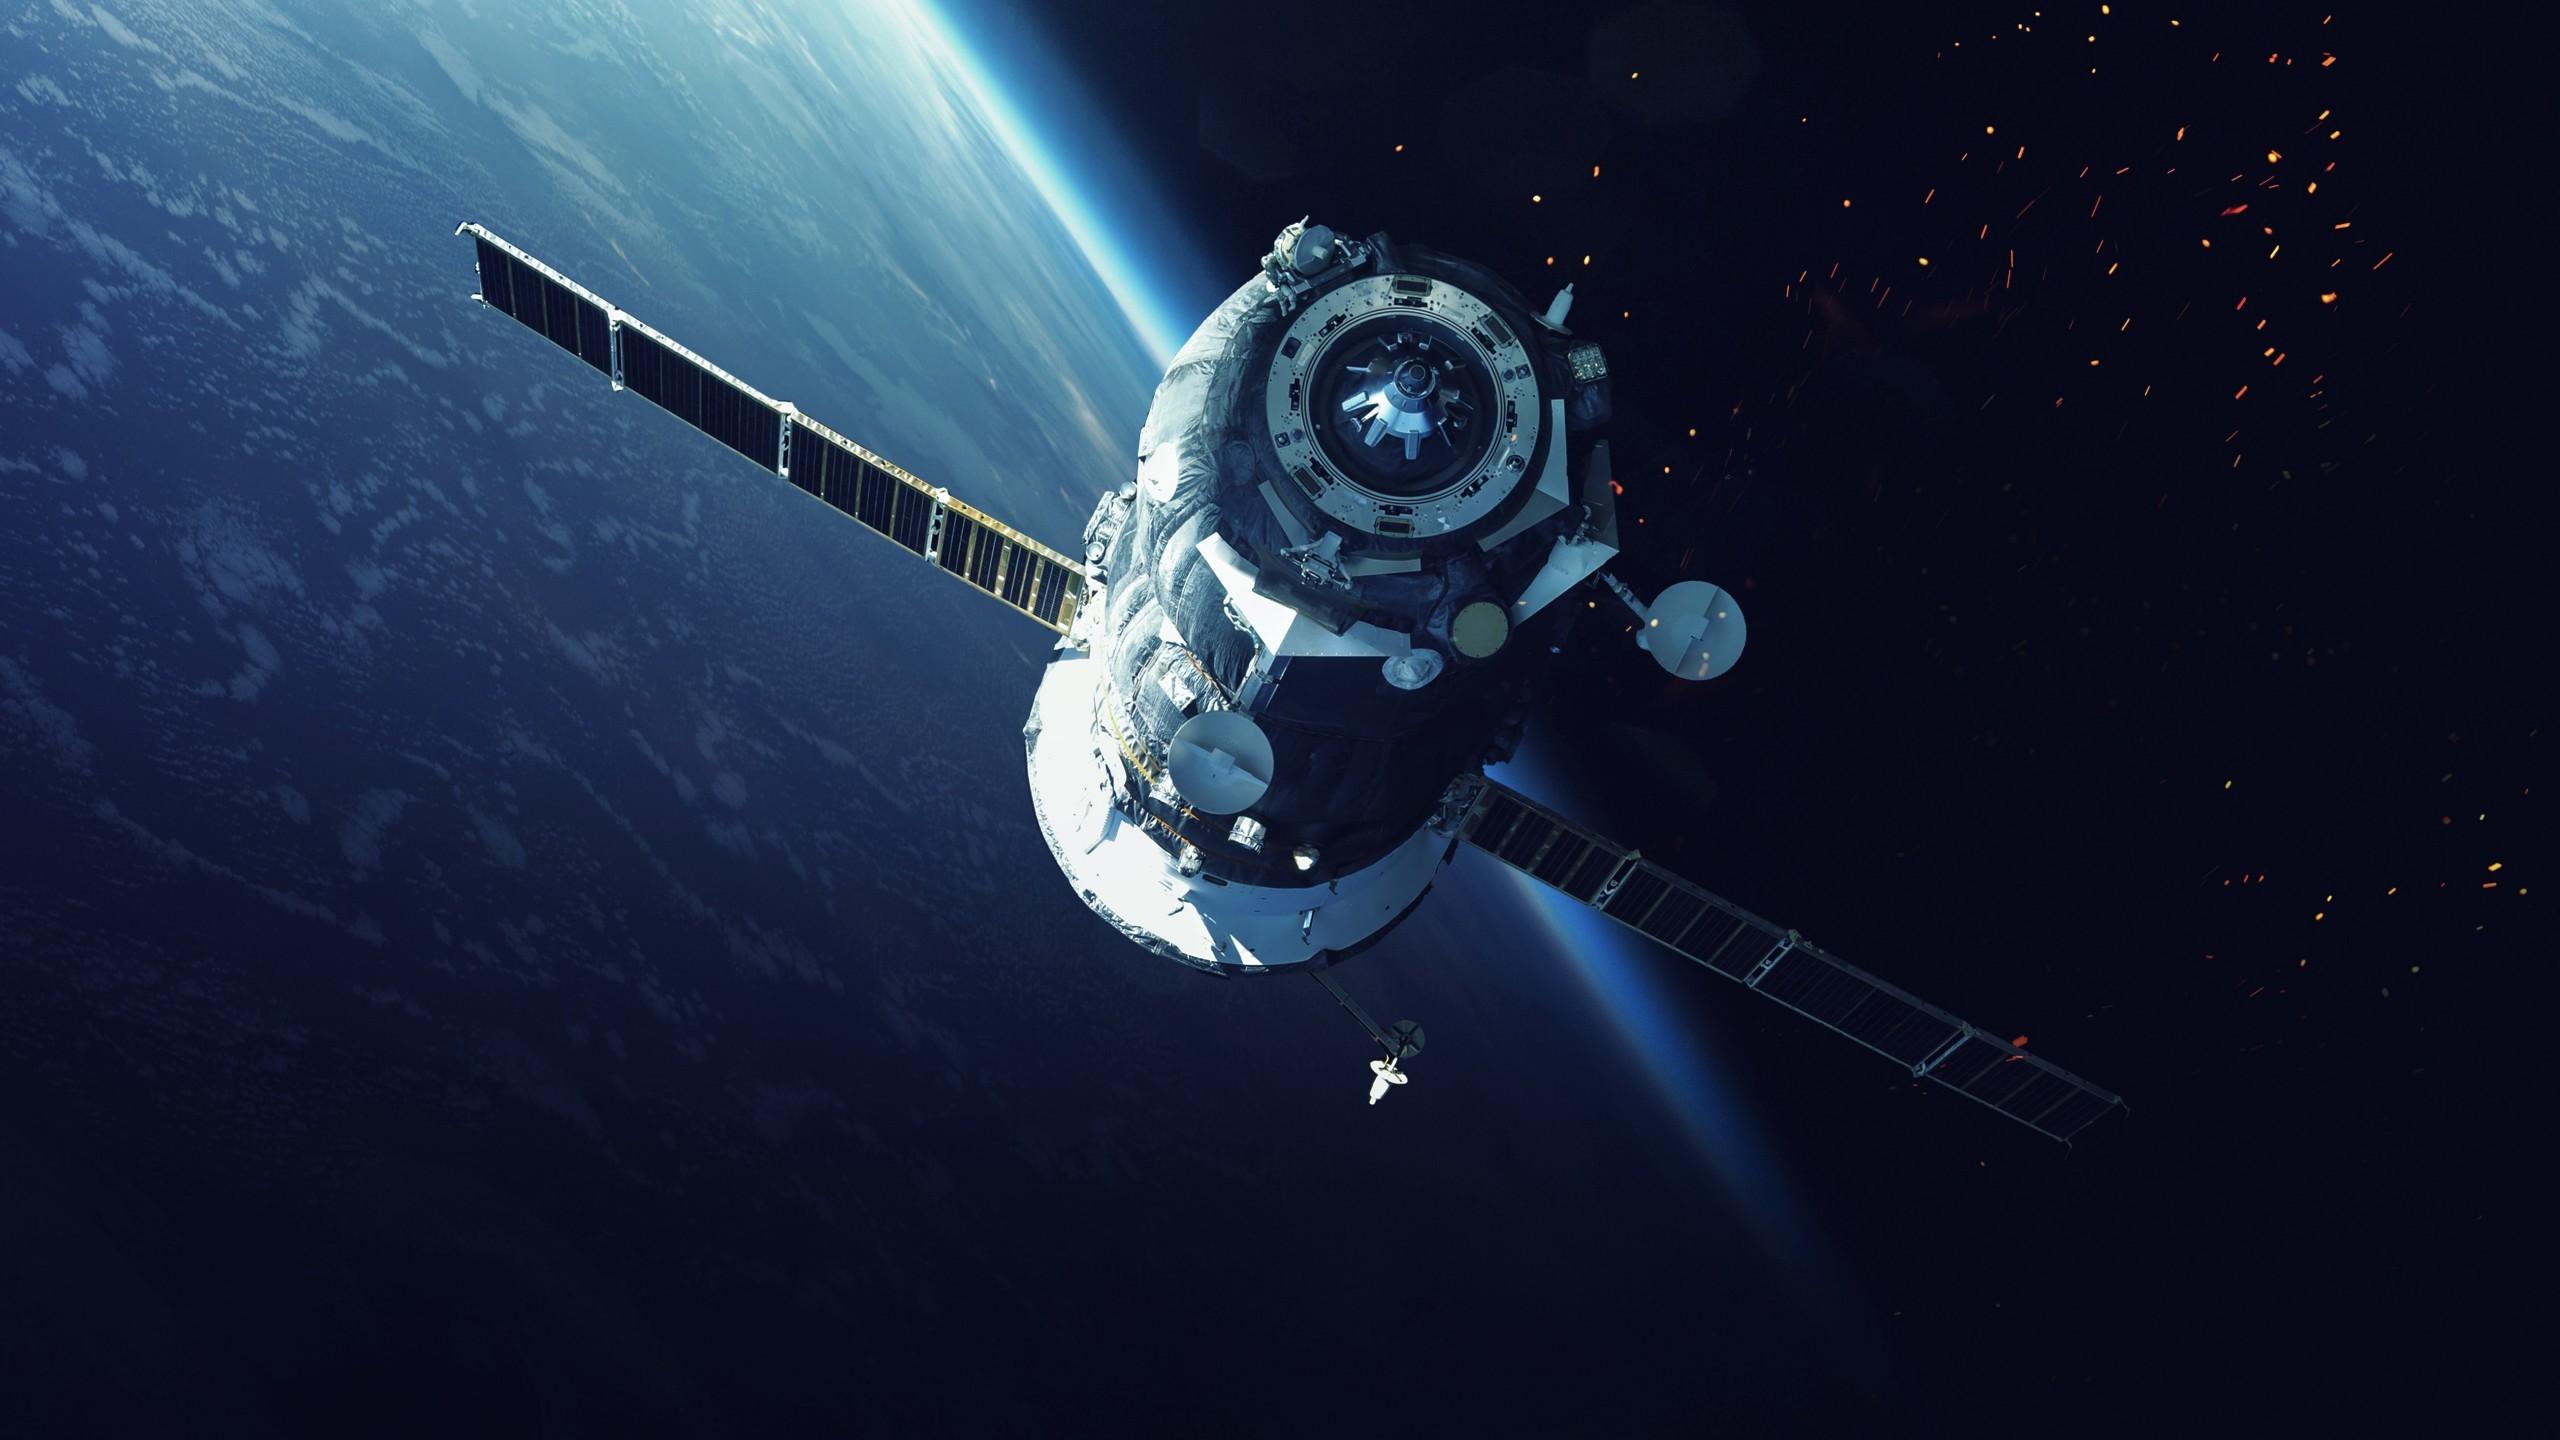 Space / Space Satellite Wallpaper